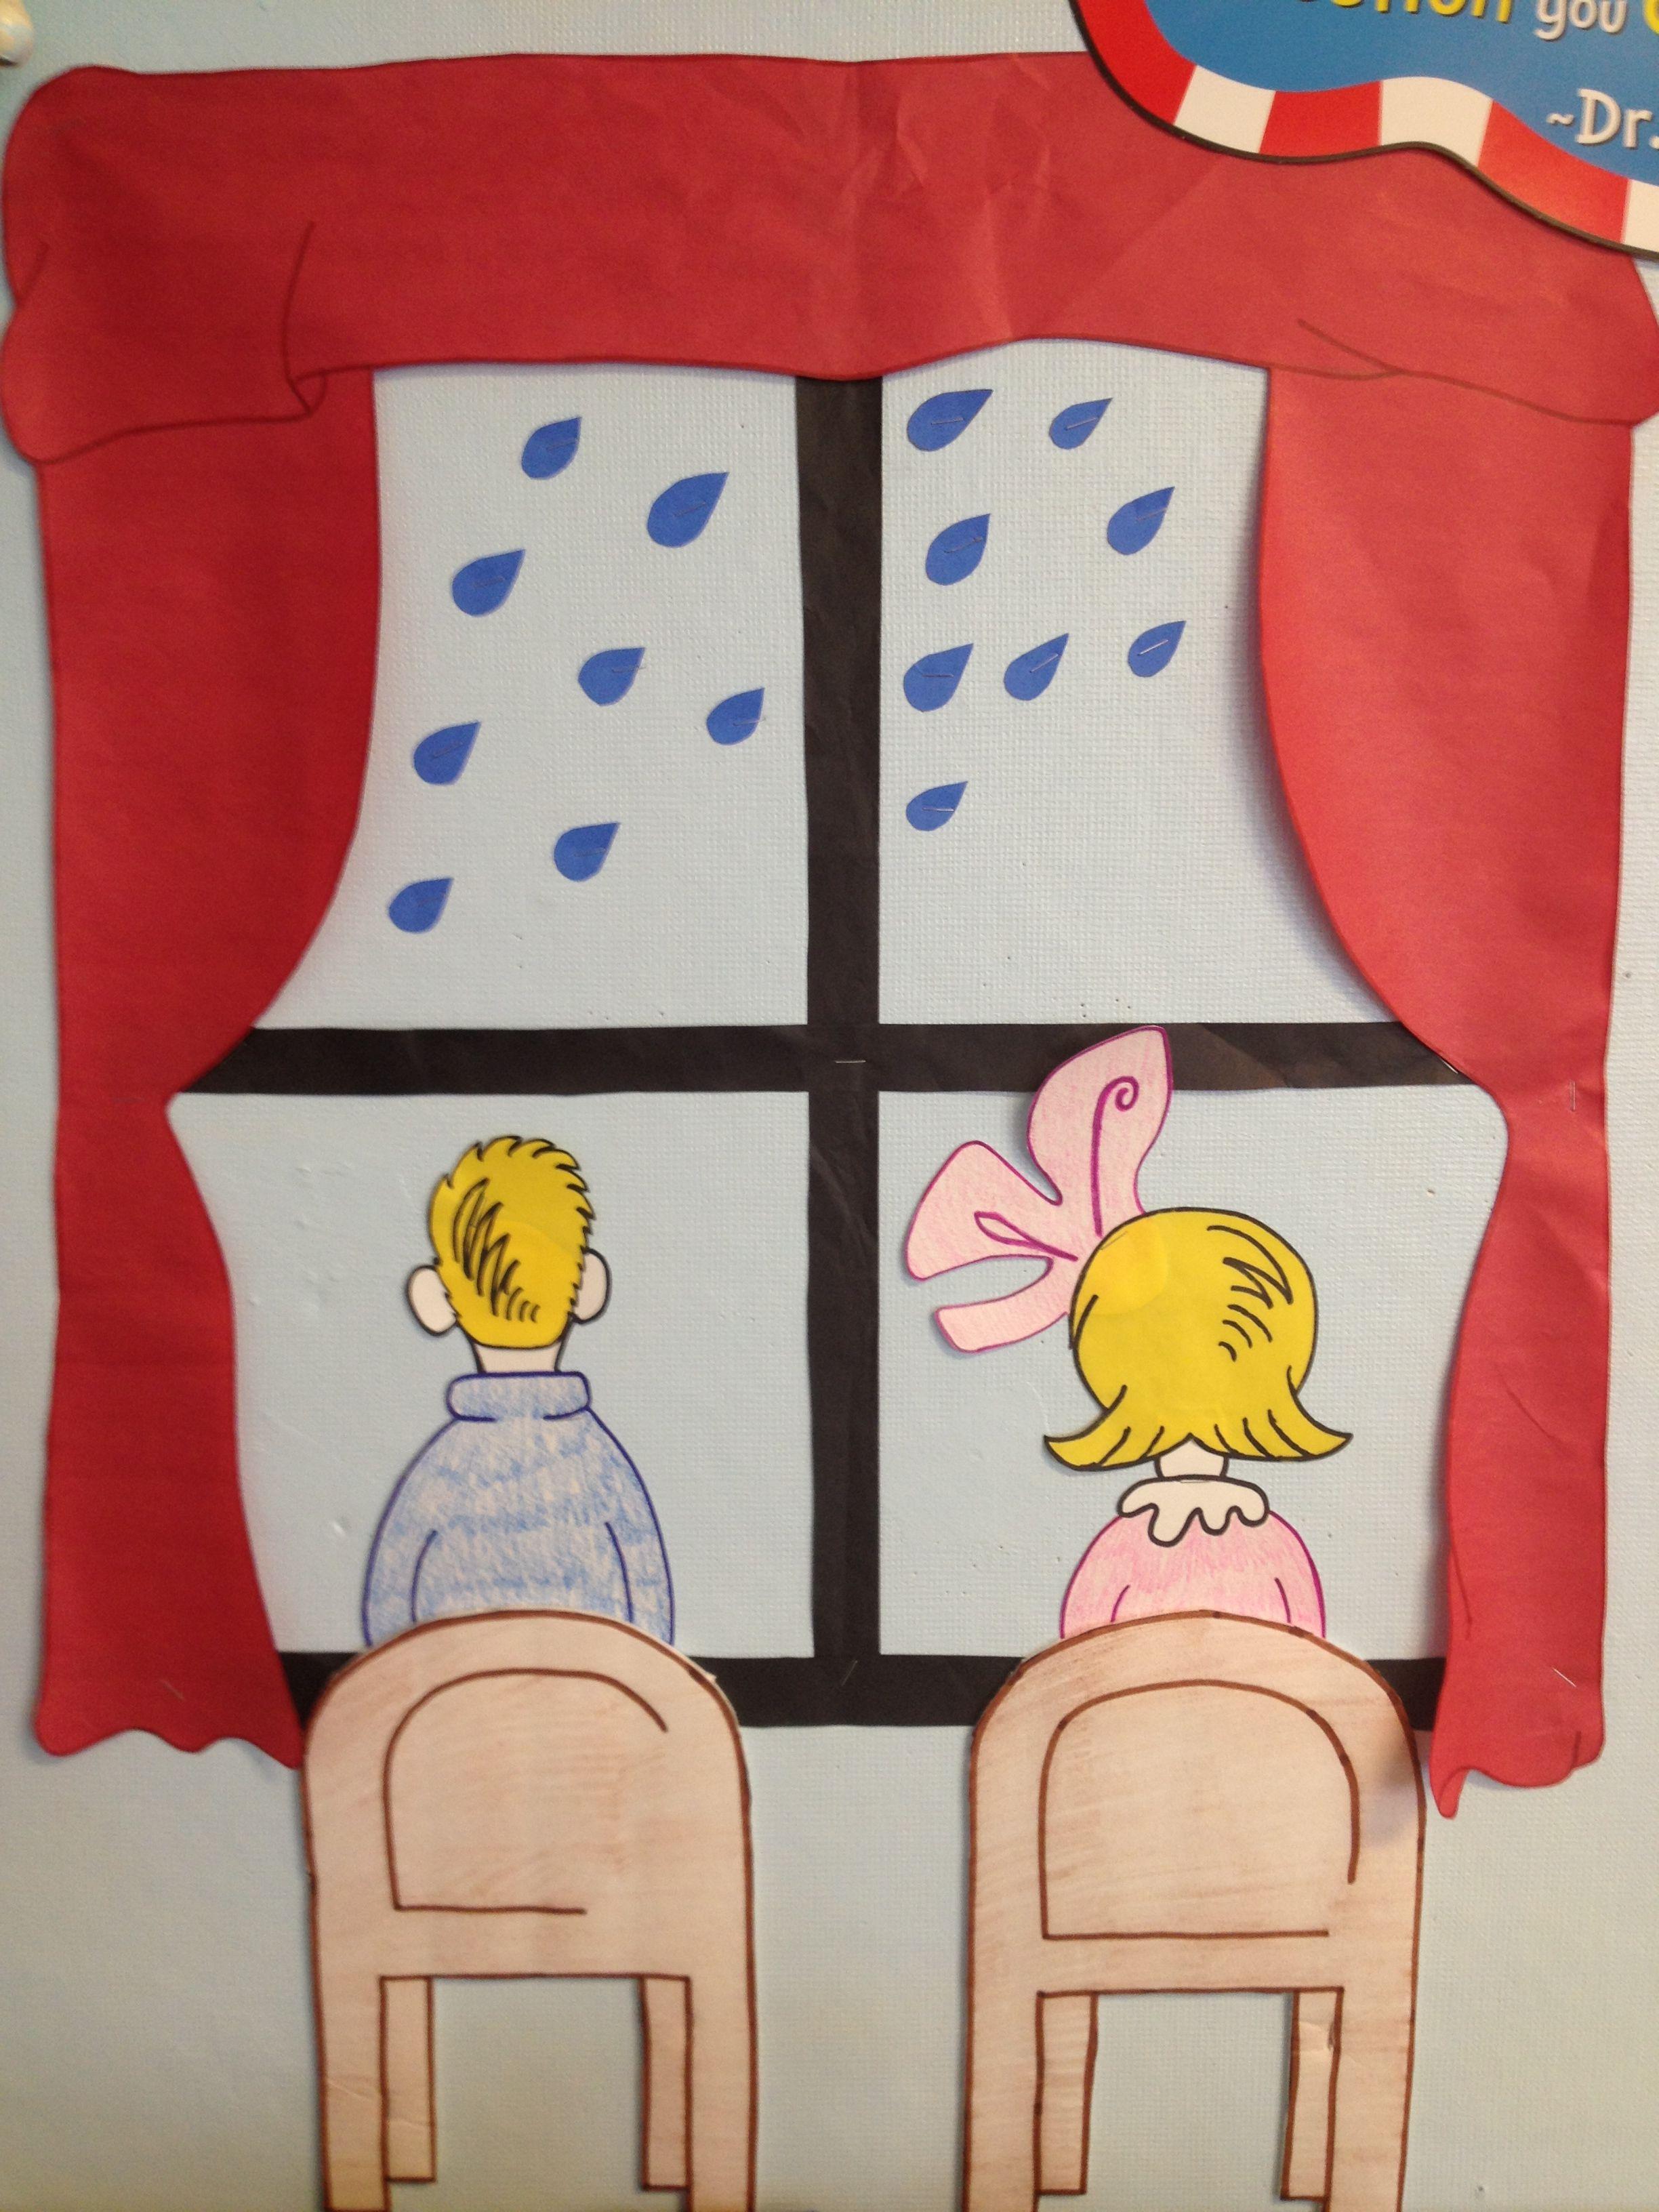 Dr. Seuss classroom decoration